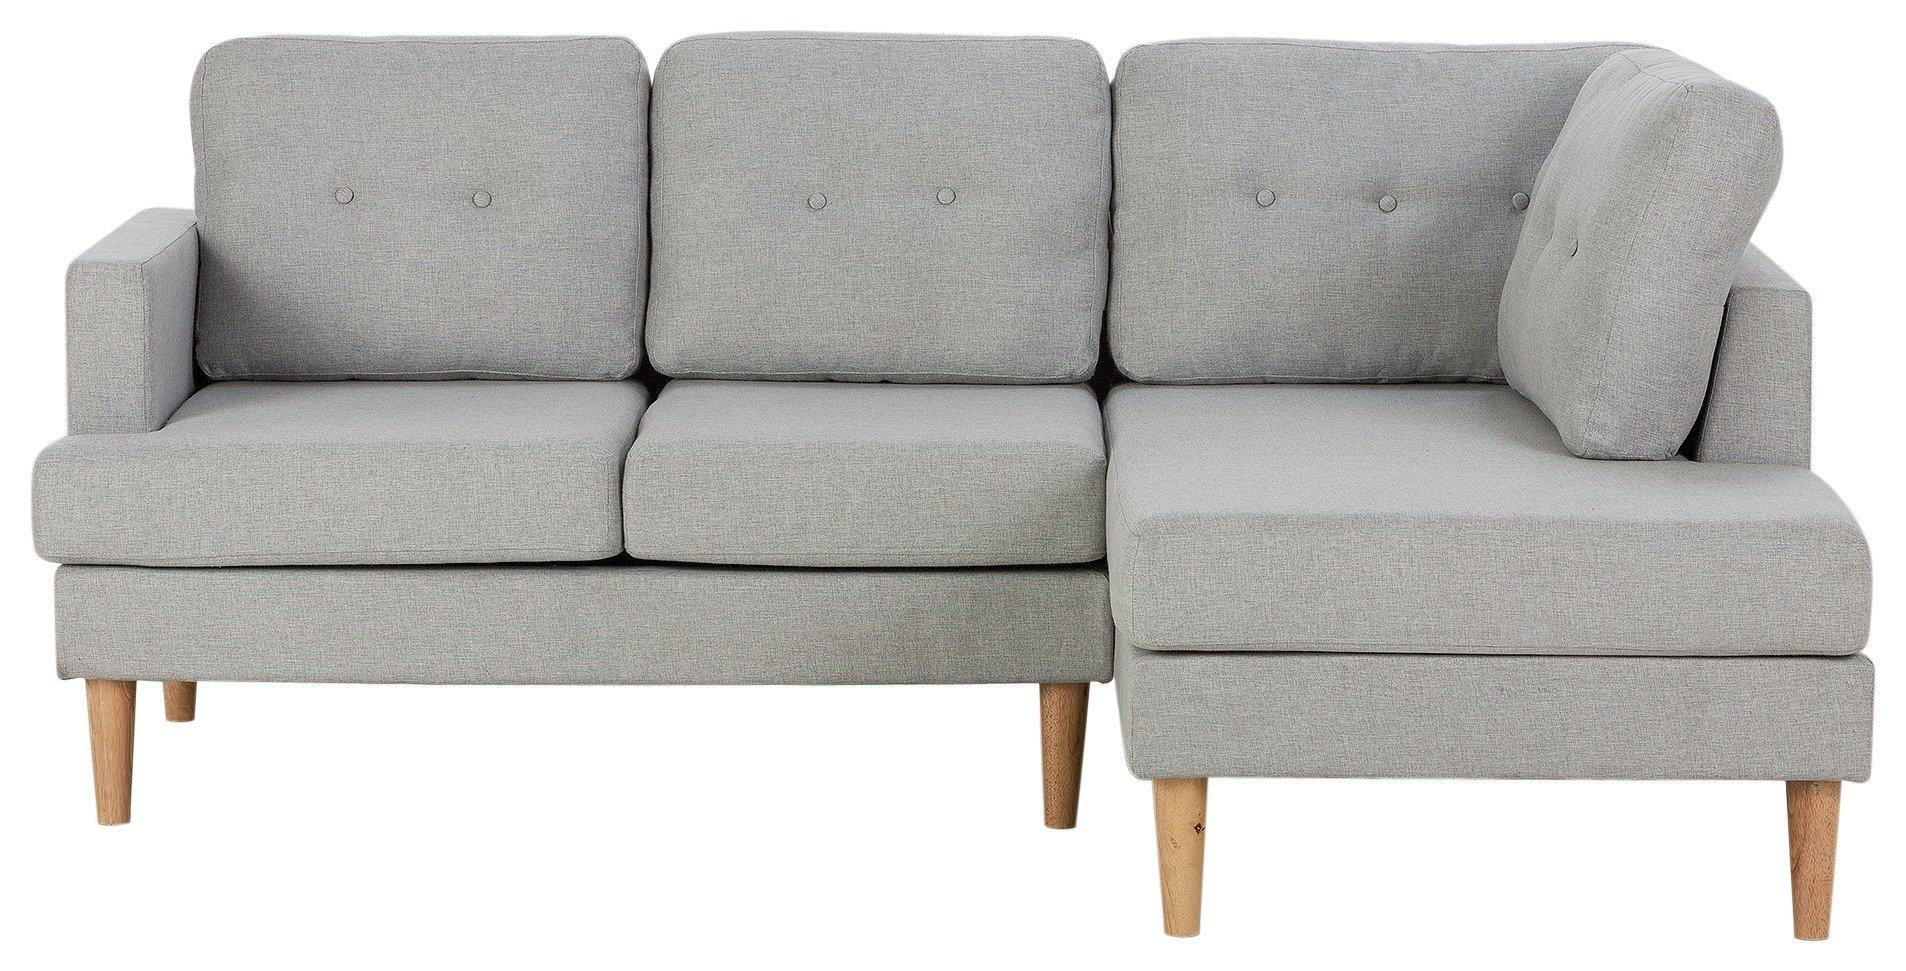 Argos Home Joshua Right Corner Fabric Sofa - Light Grey